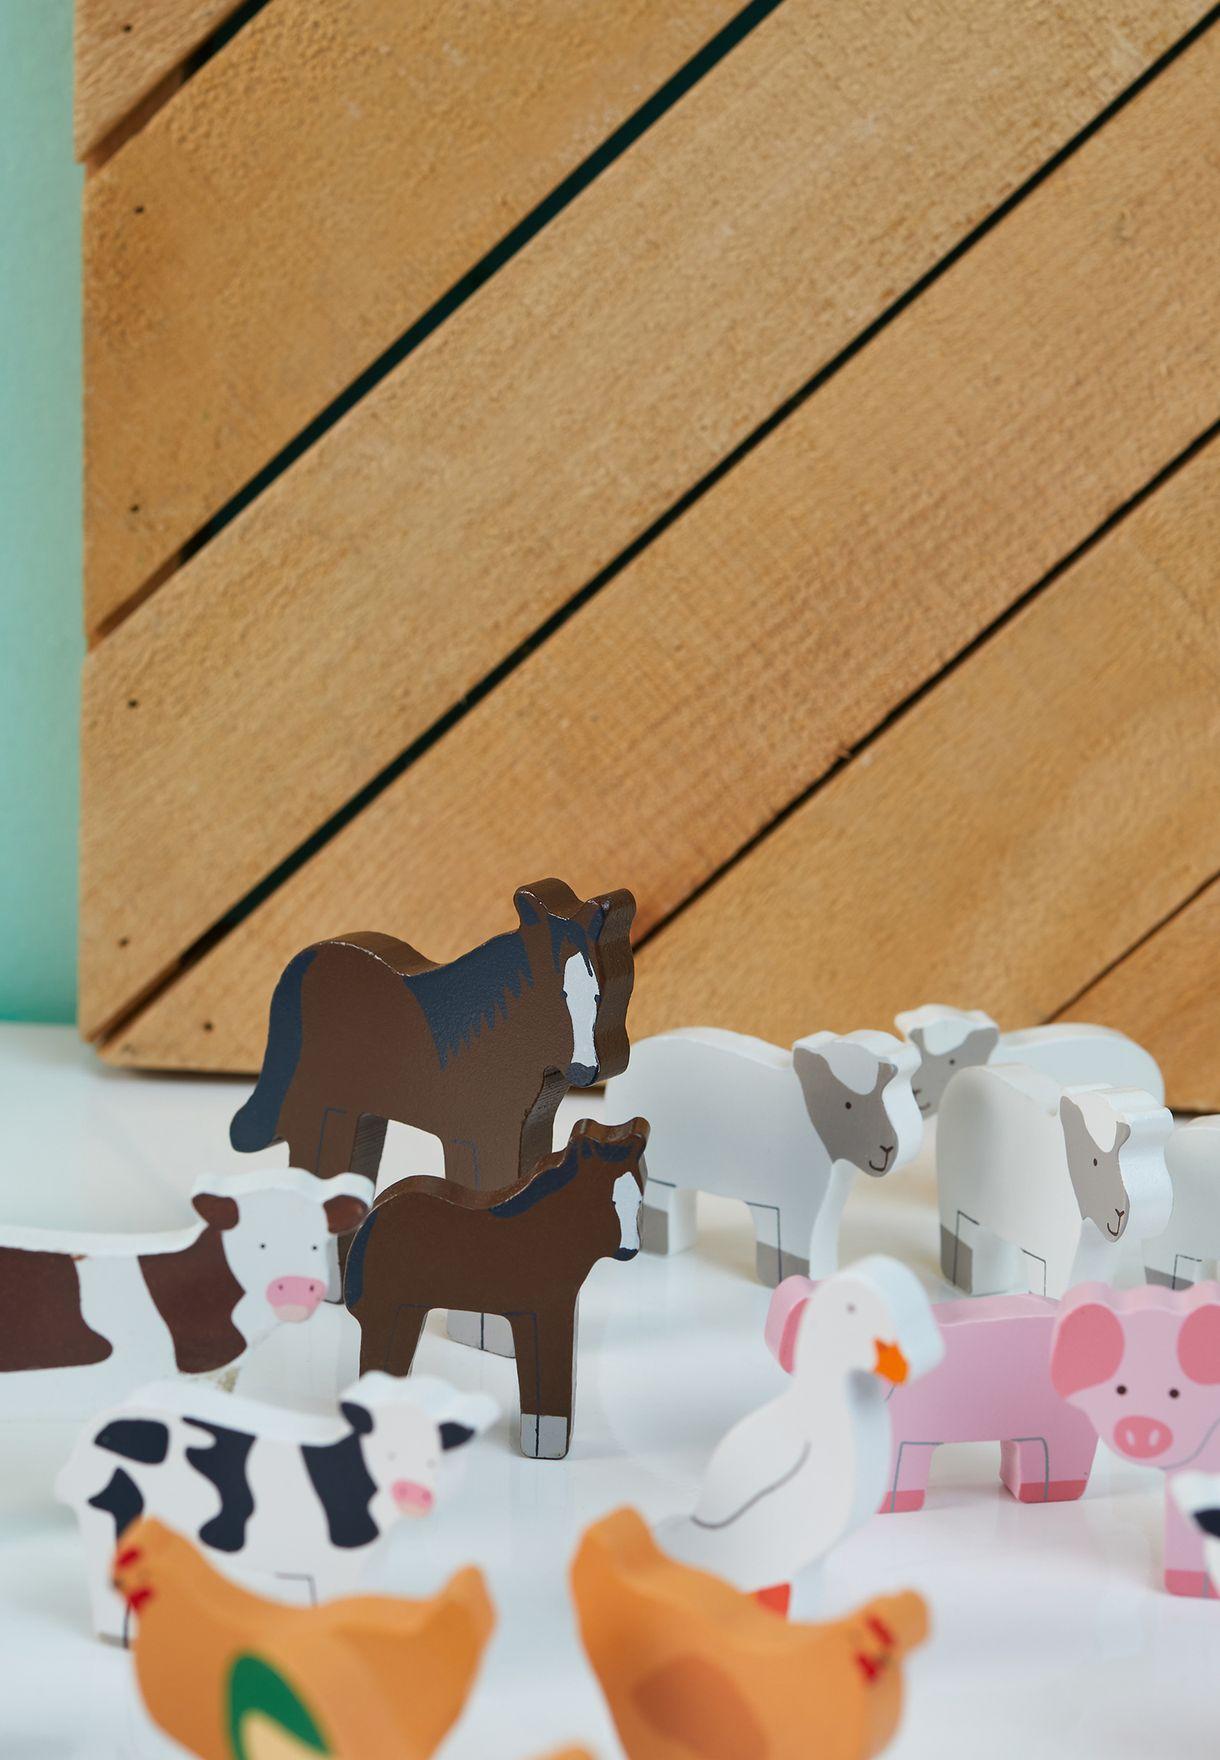 Pocket Farm Animals Toy Set